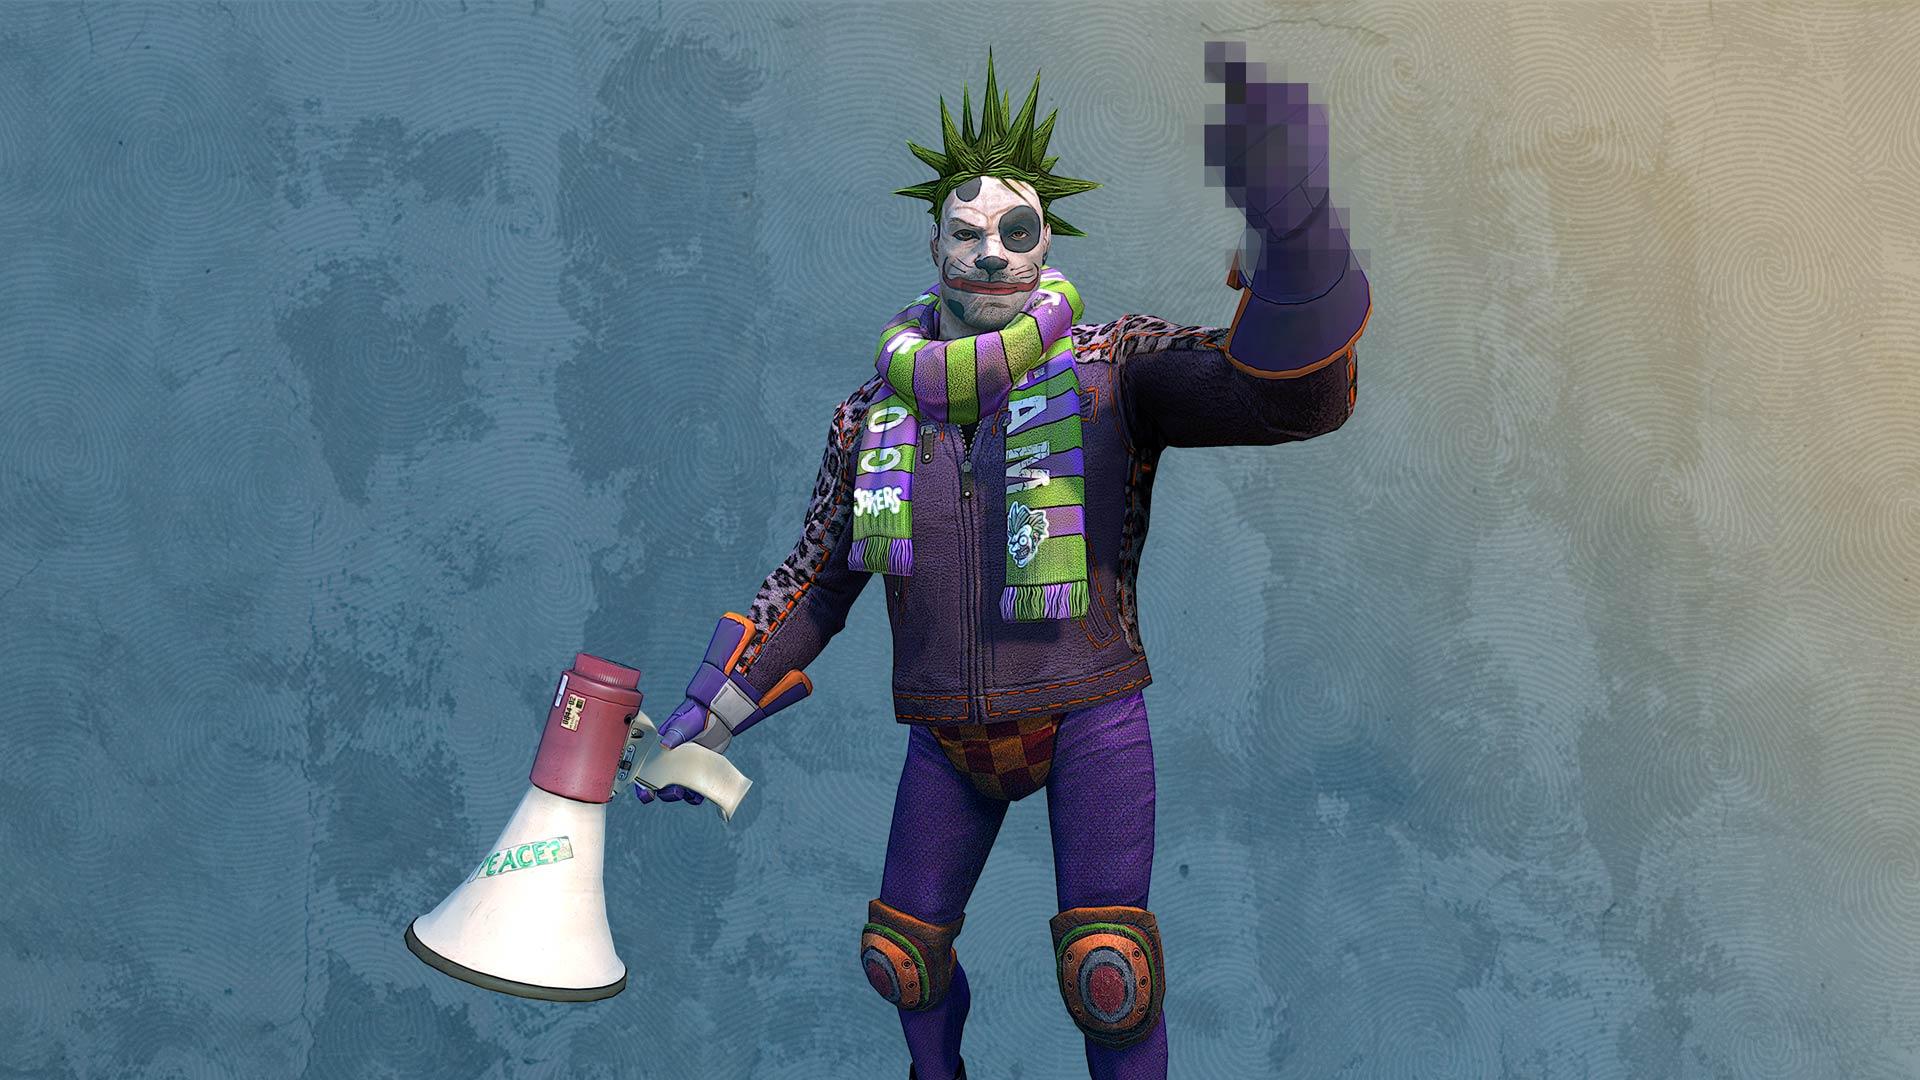 Gotham City Impostors Wallpaper File:gotham City Impostors